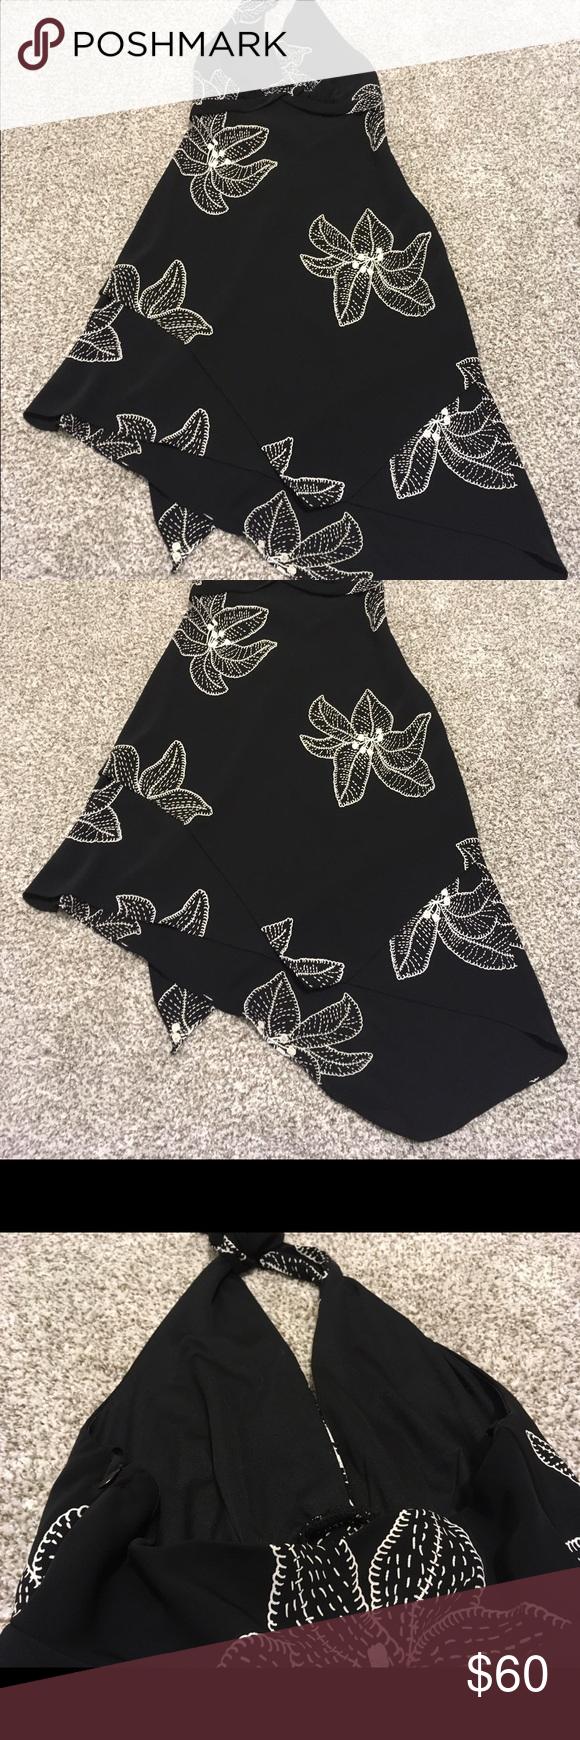 Sl fashions size asymmetrical halter dress this sl fashions